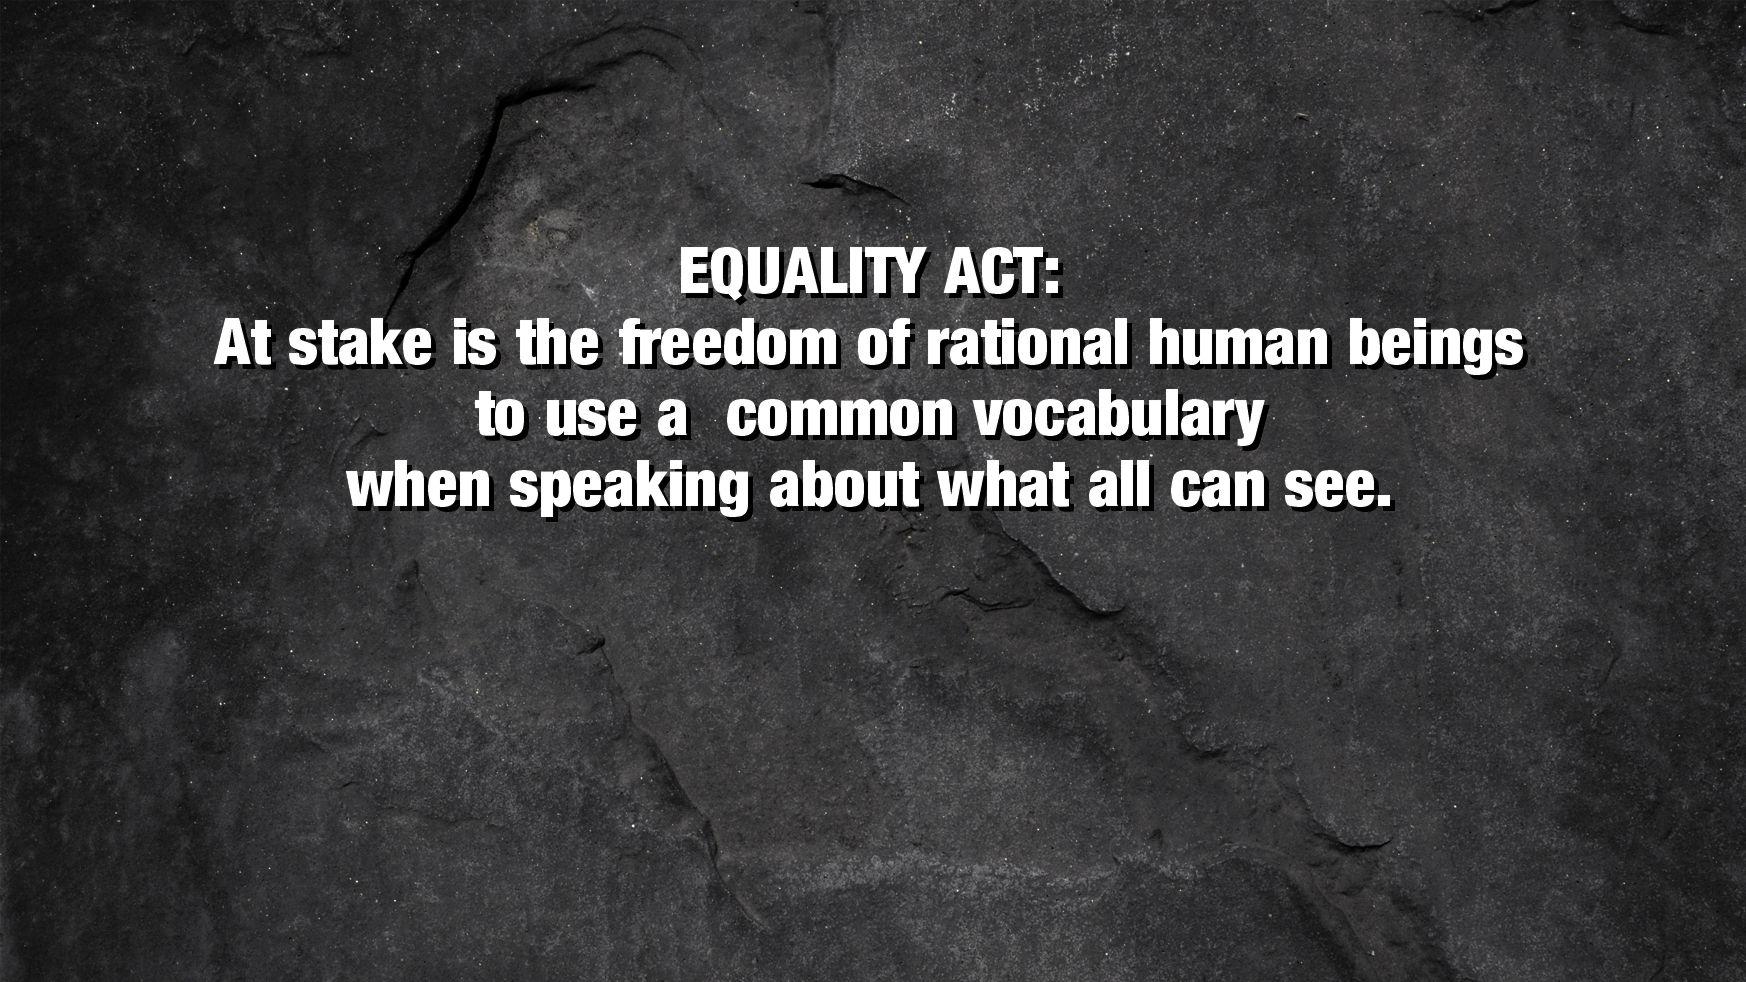 H.R. 5 Equality Act